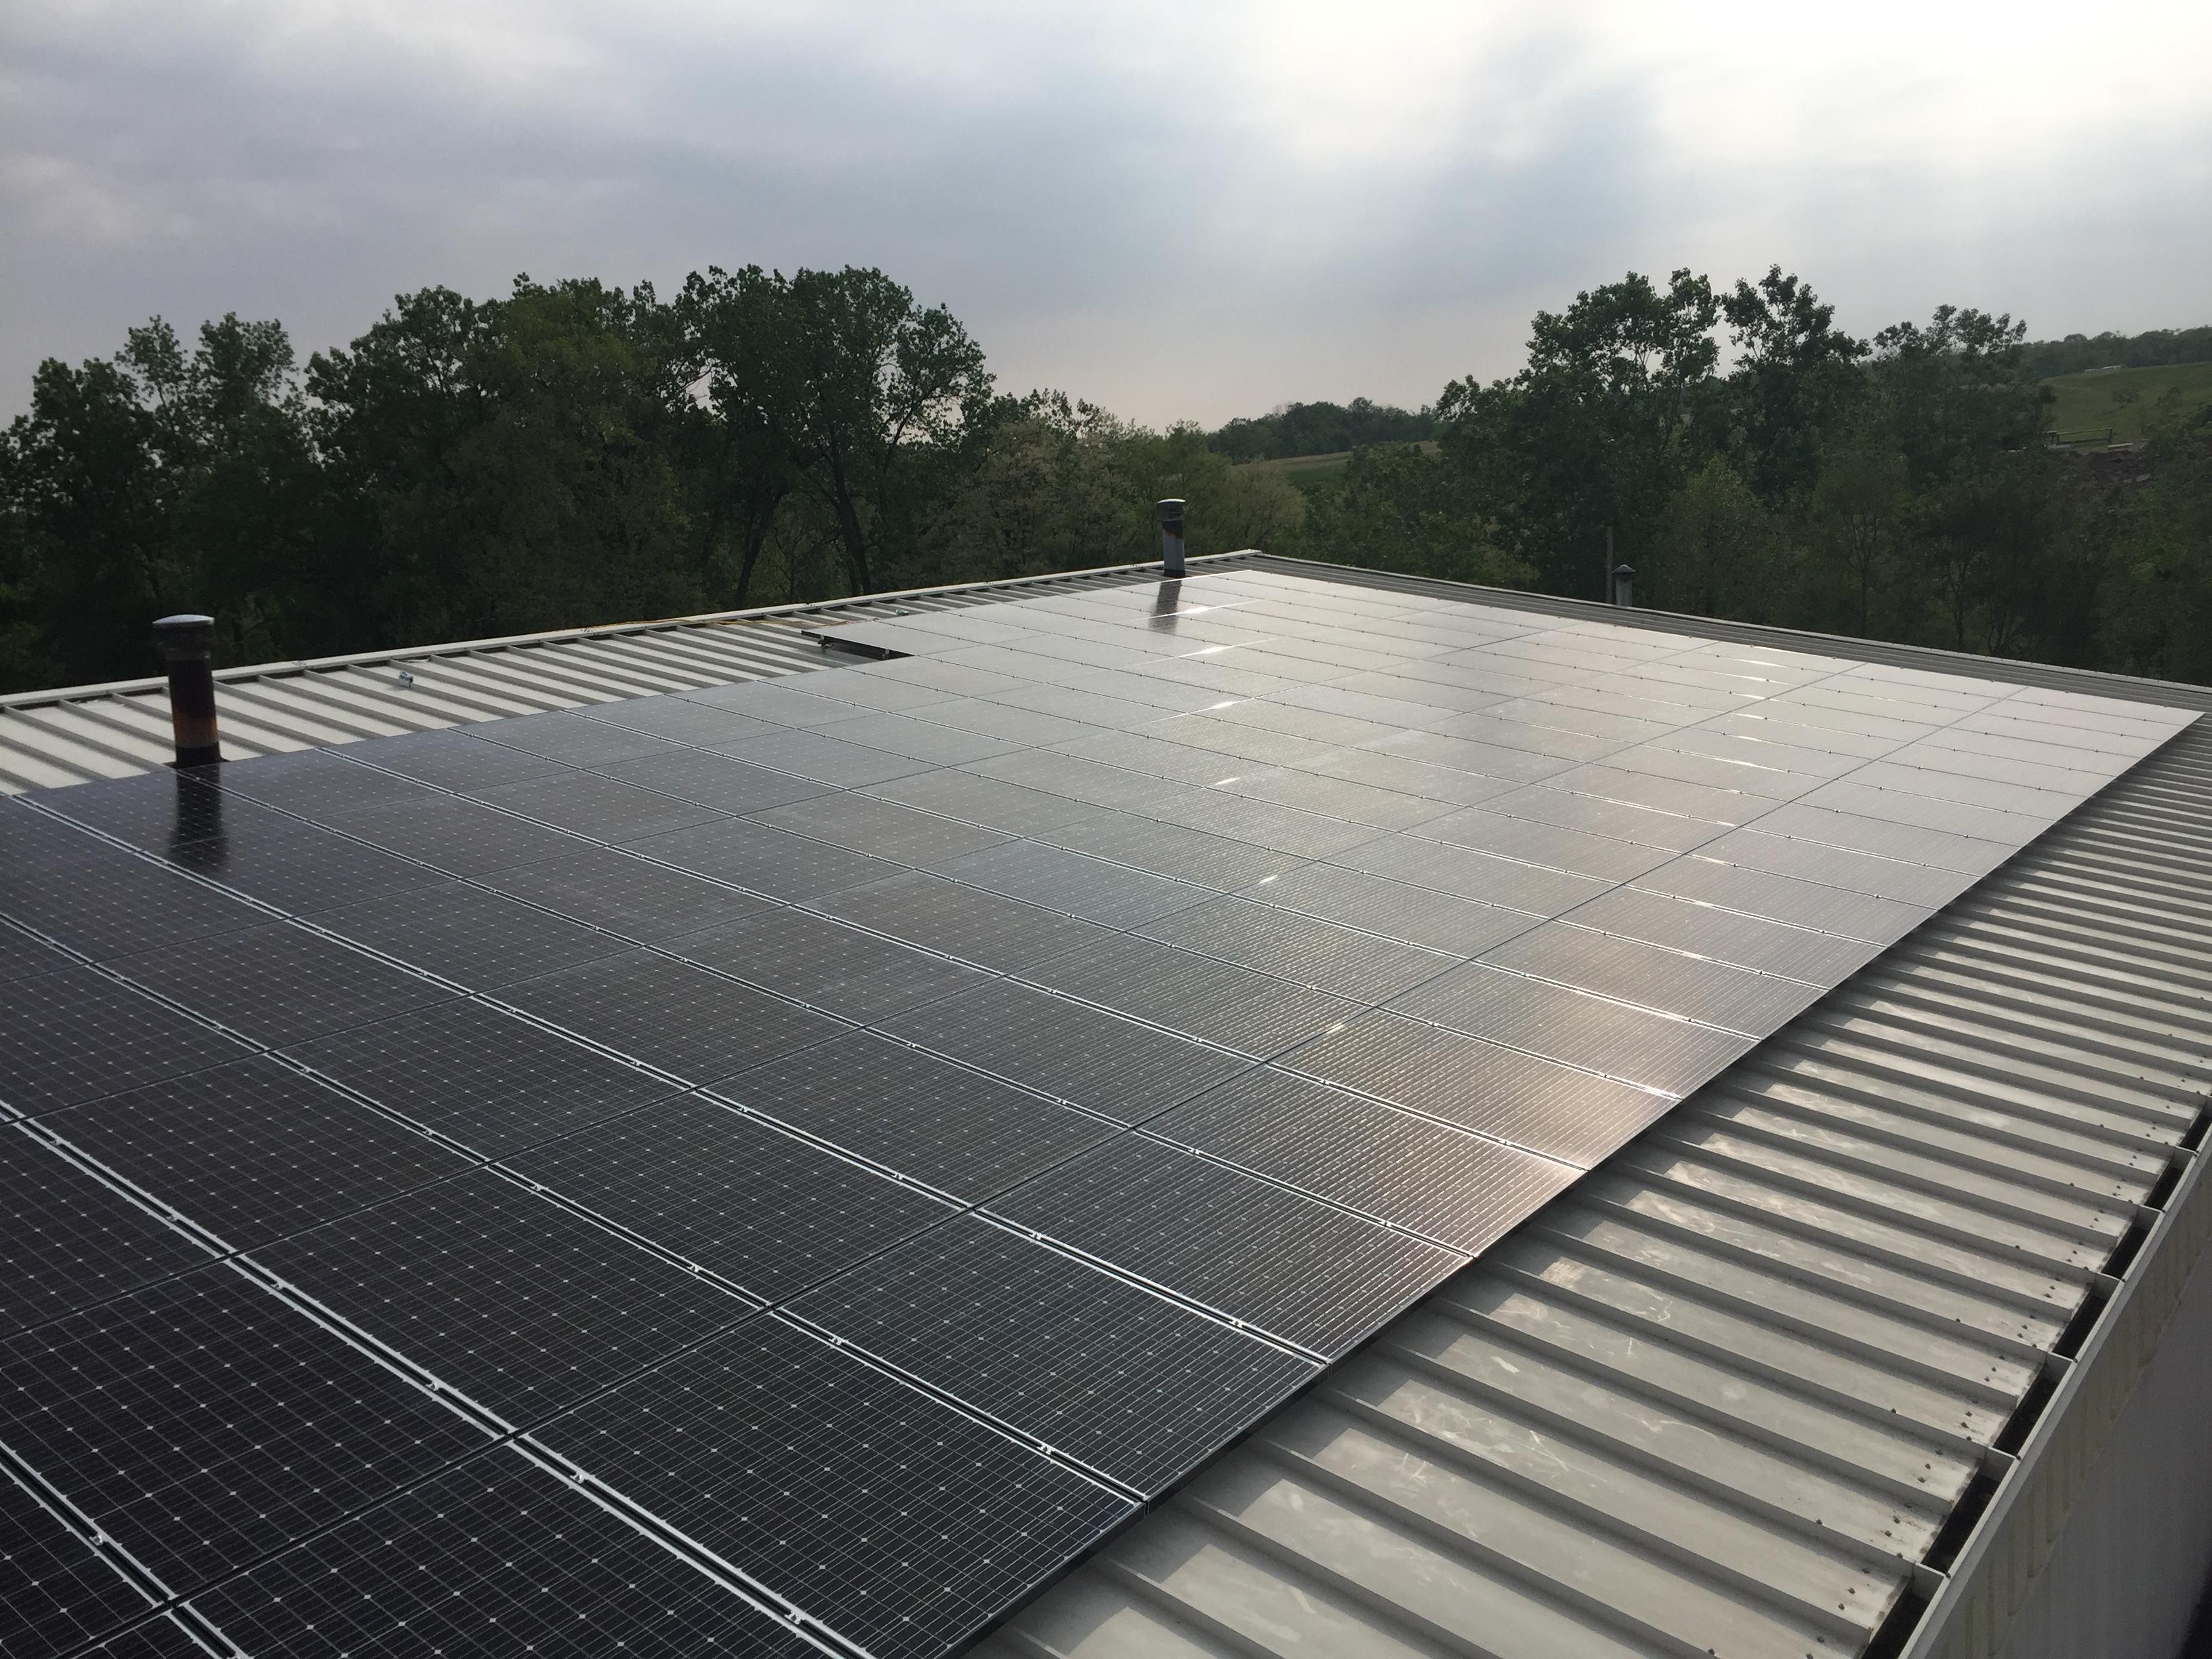 160 Mitsubishi Solar Modules